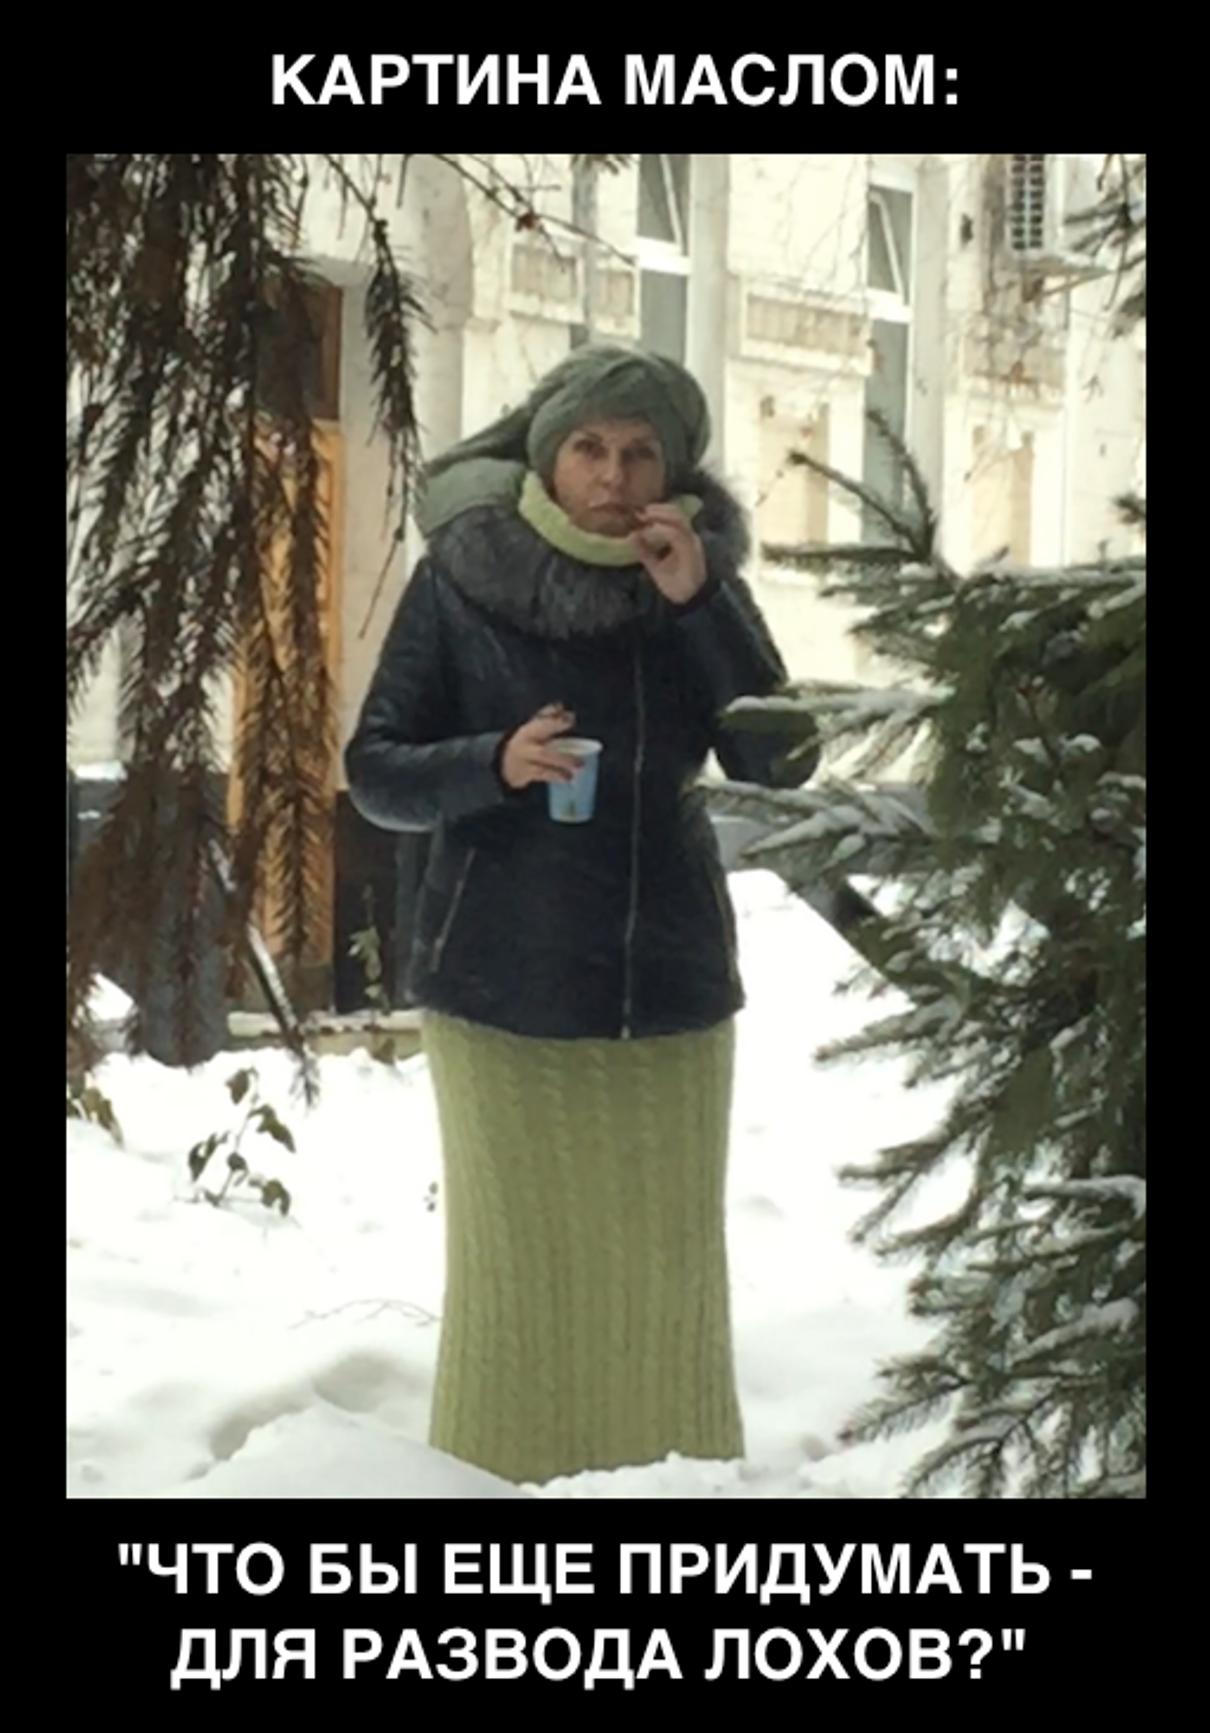 Жалоба-отзыв: Мария Скаложабская - Мария Скаложабская мошенница.  Фото №2